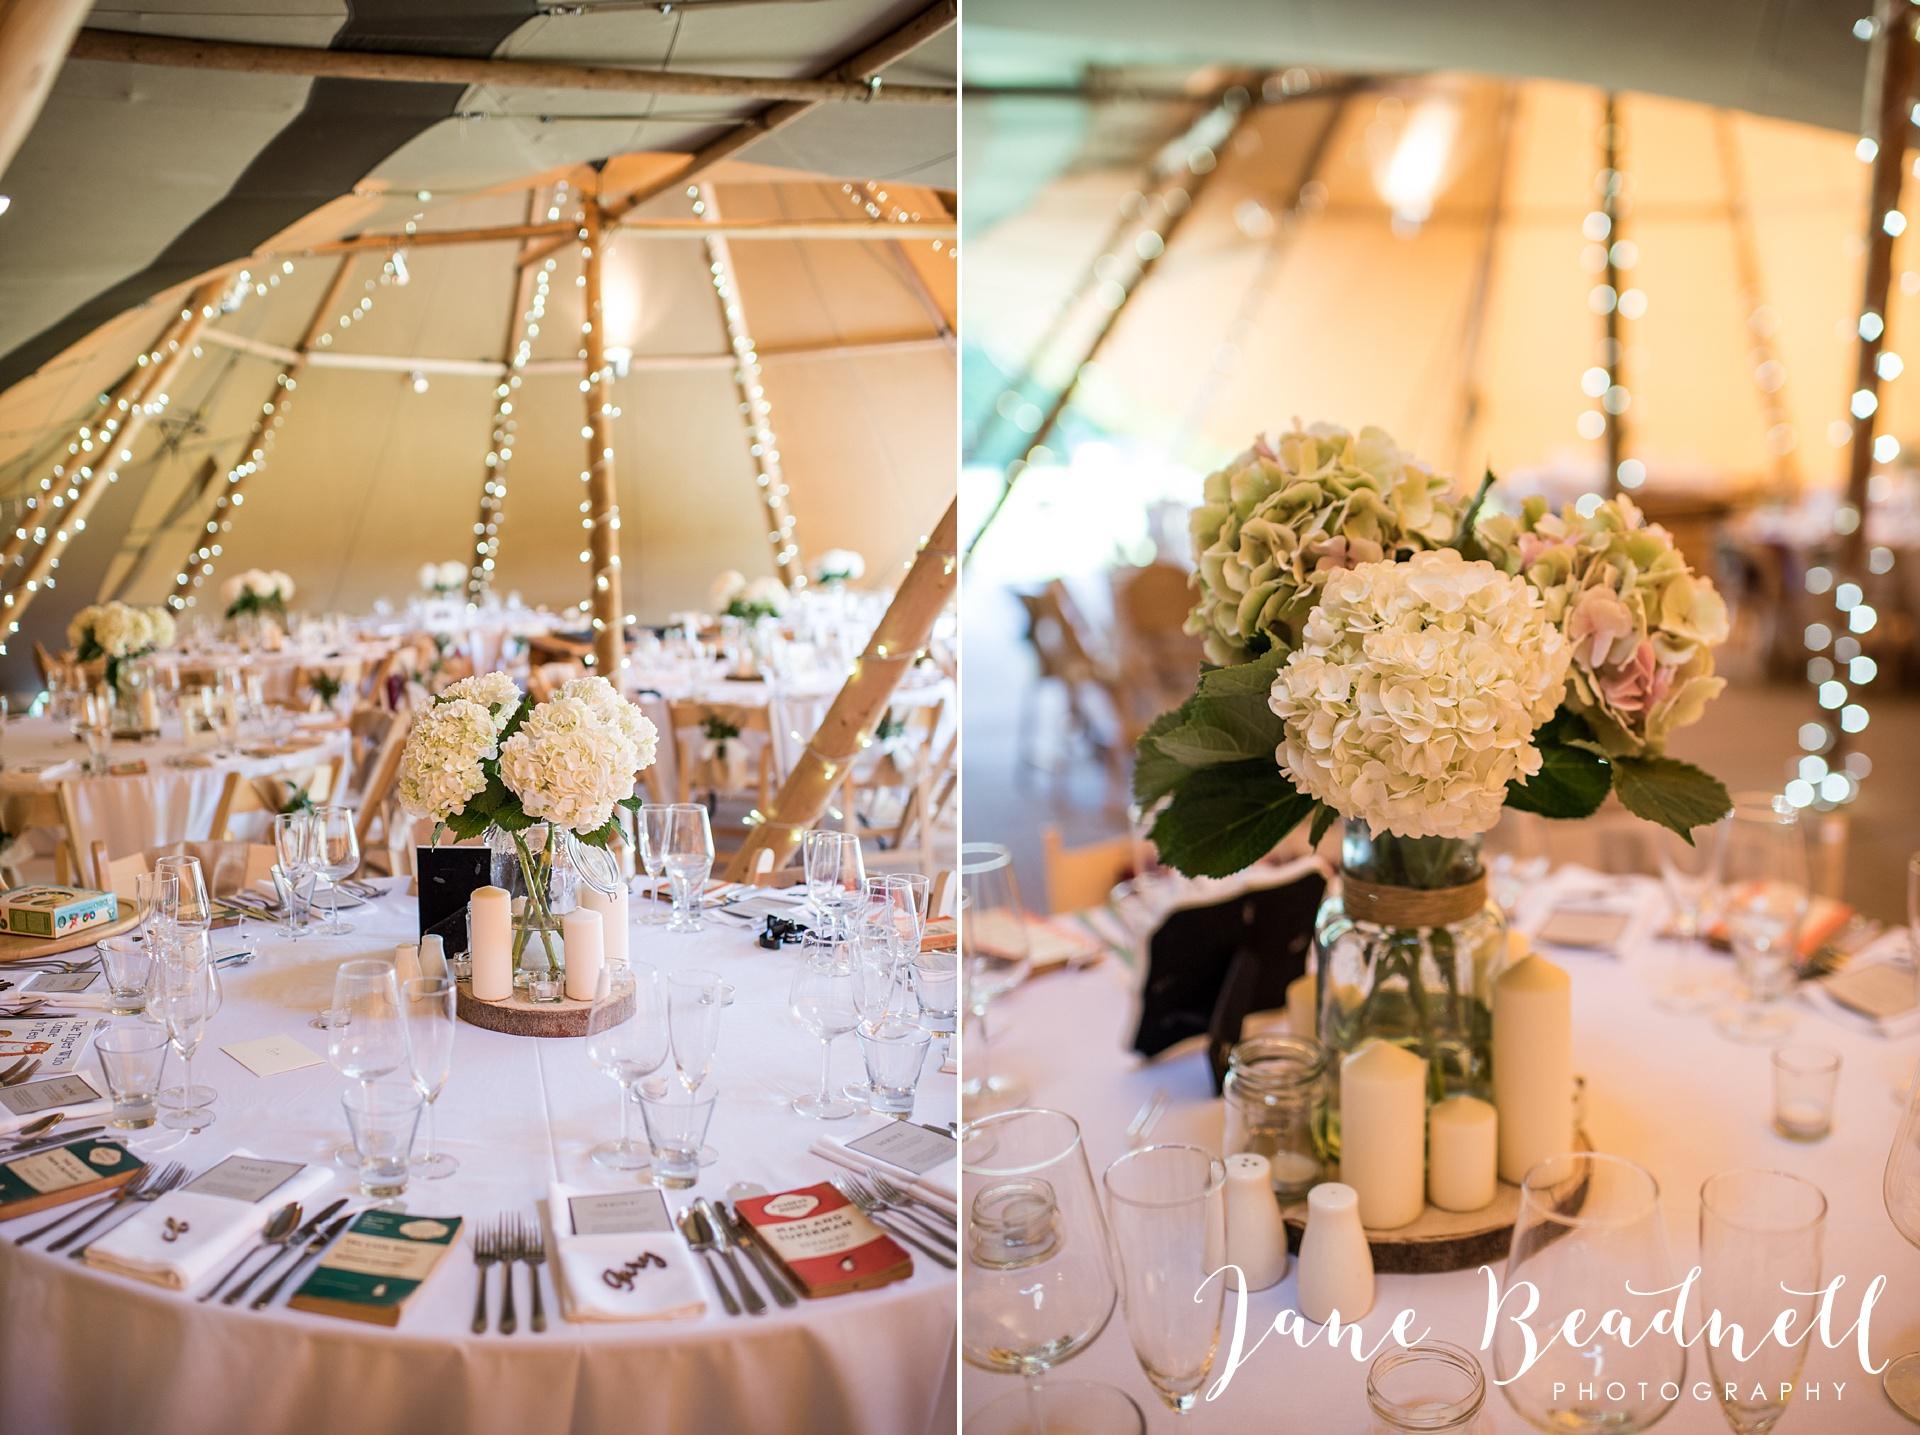 fine-art-wedding-photographer-jane-beadnell-yorkshire-wedding-photographer_0100